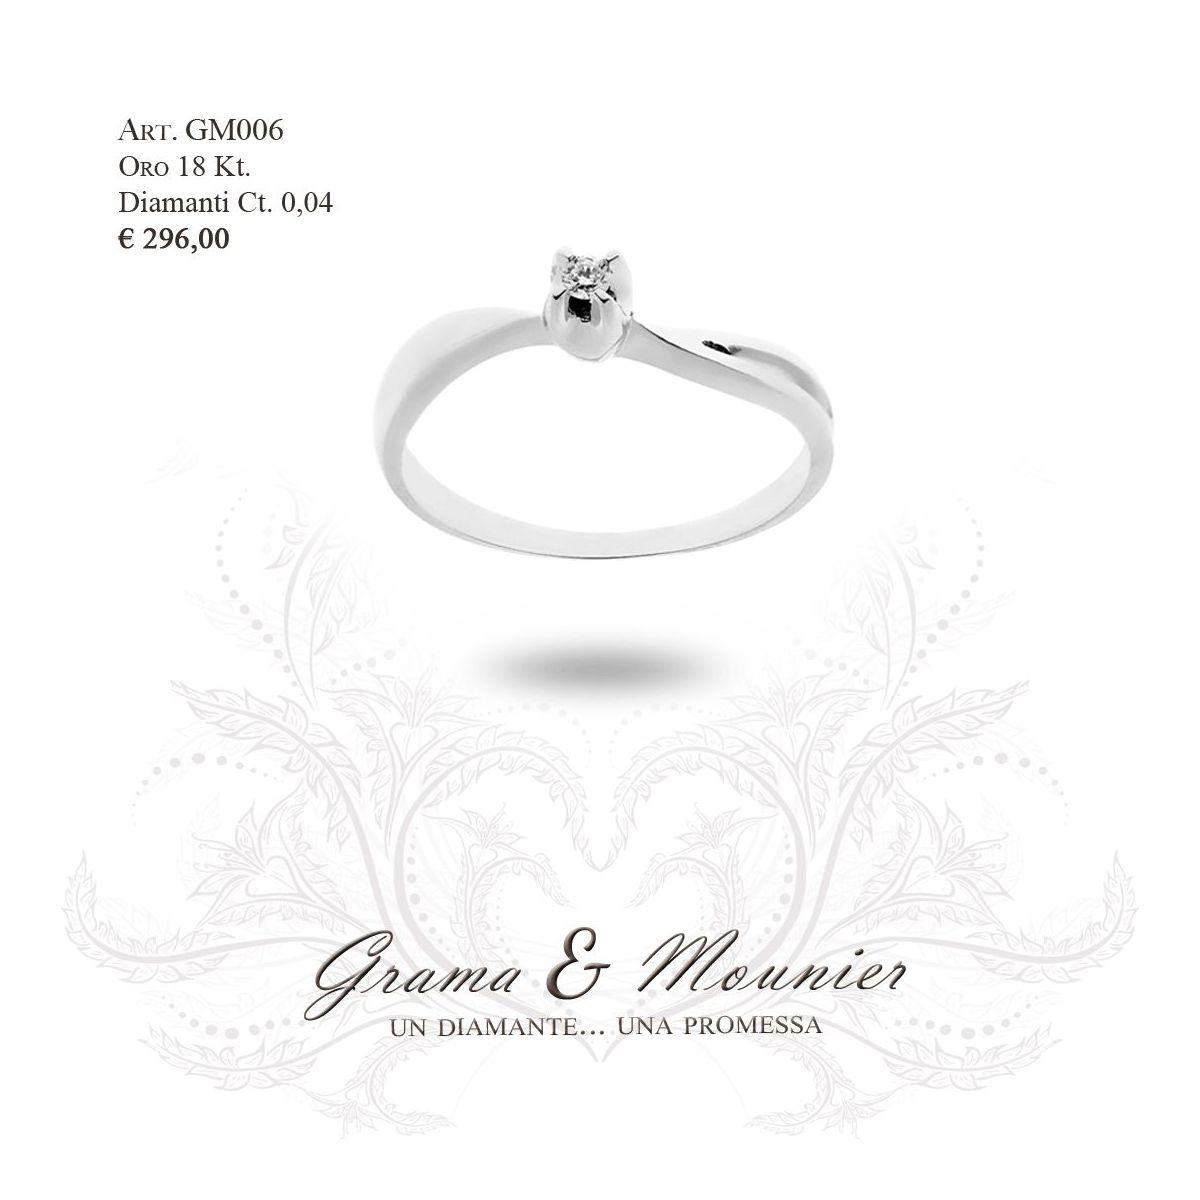 Anello in oro 18Kt. Grama&Mounier Art.GM006